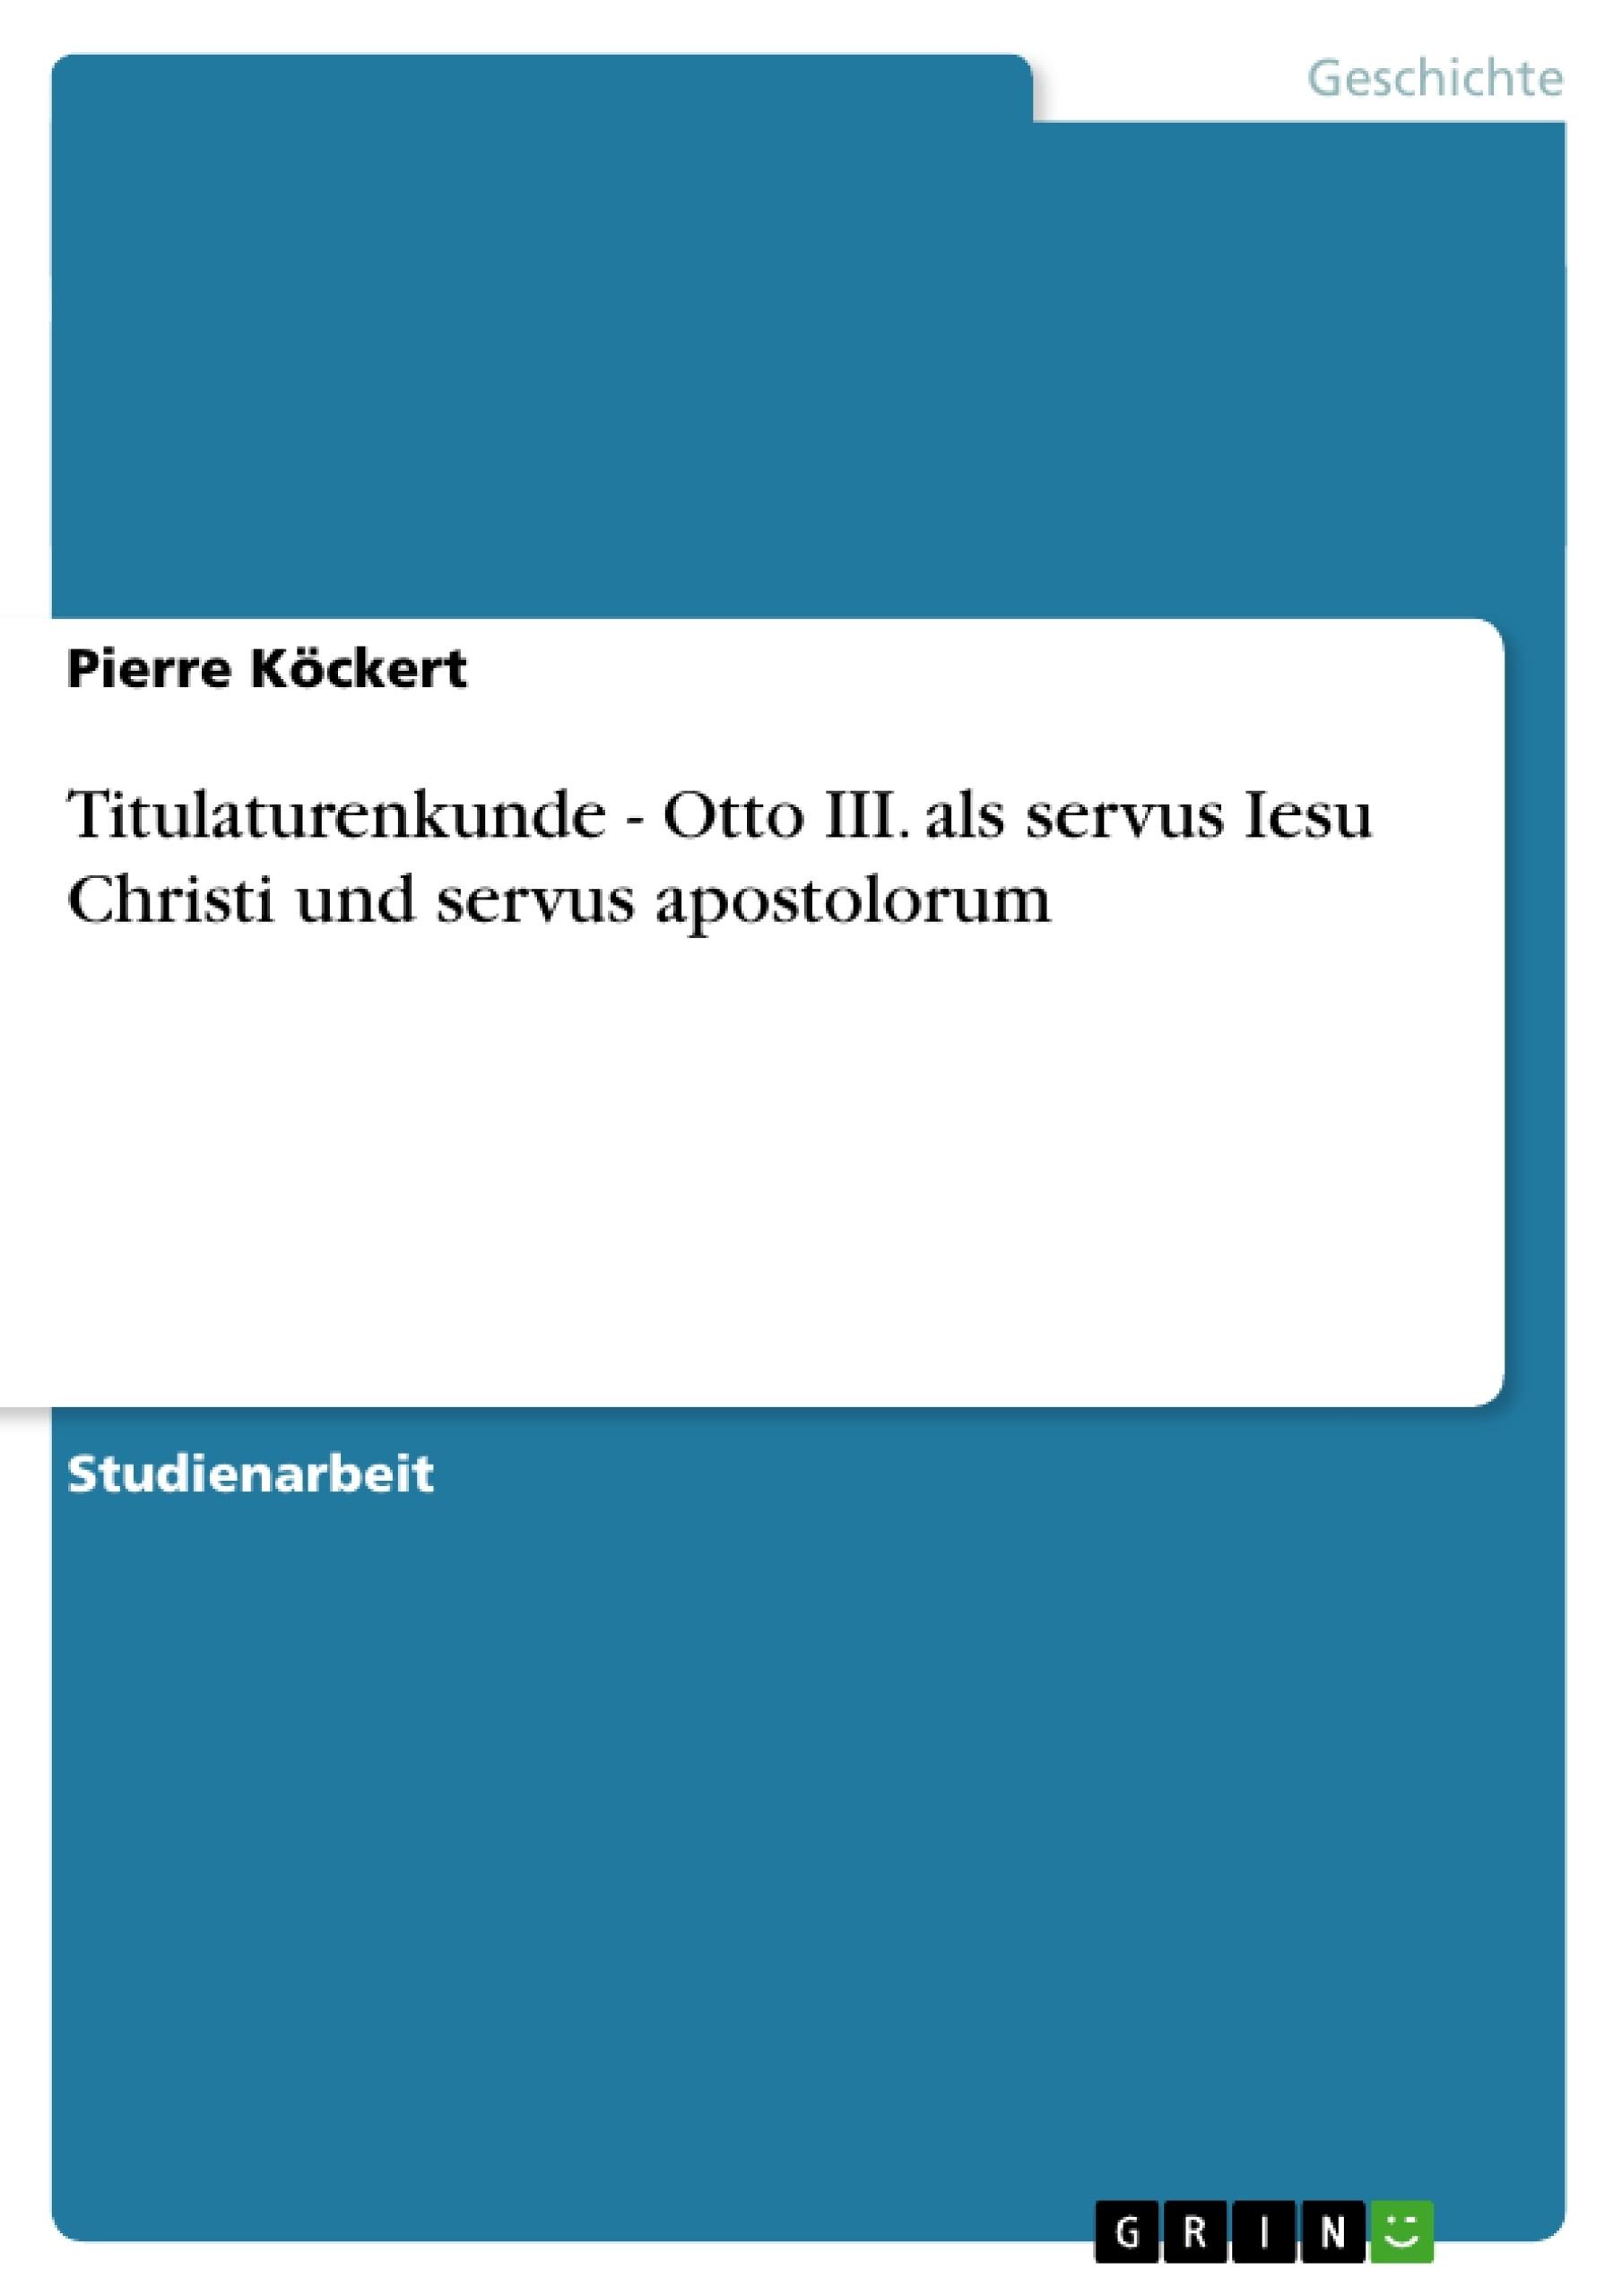 Titel: Titulaturenkunde - Otto III. als servus Iesu Christi und servus apostolorum